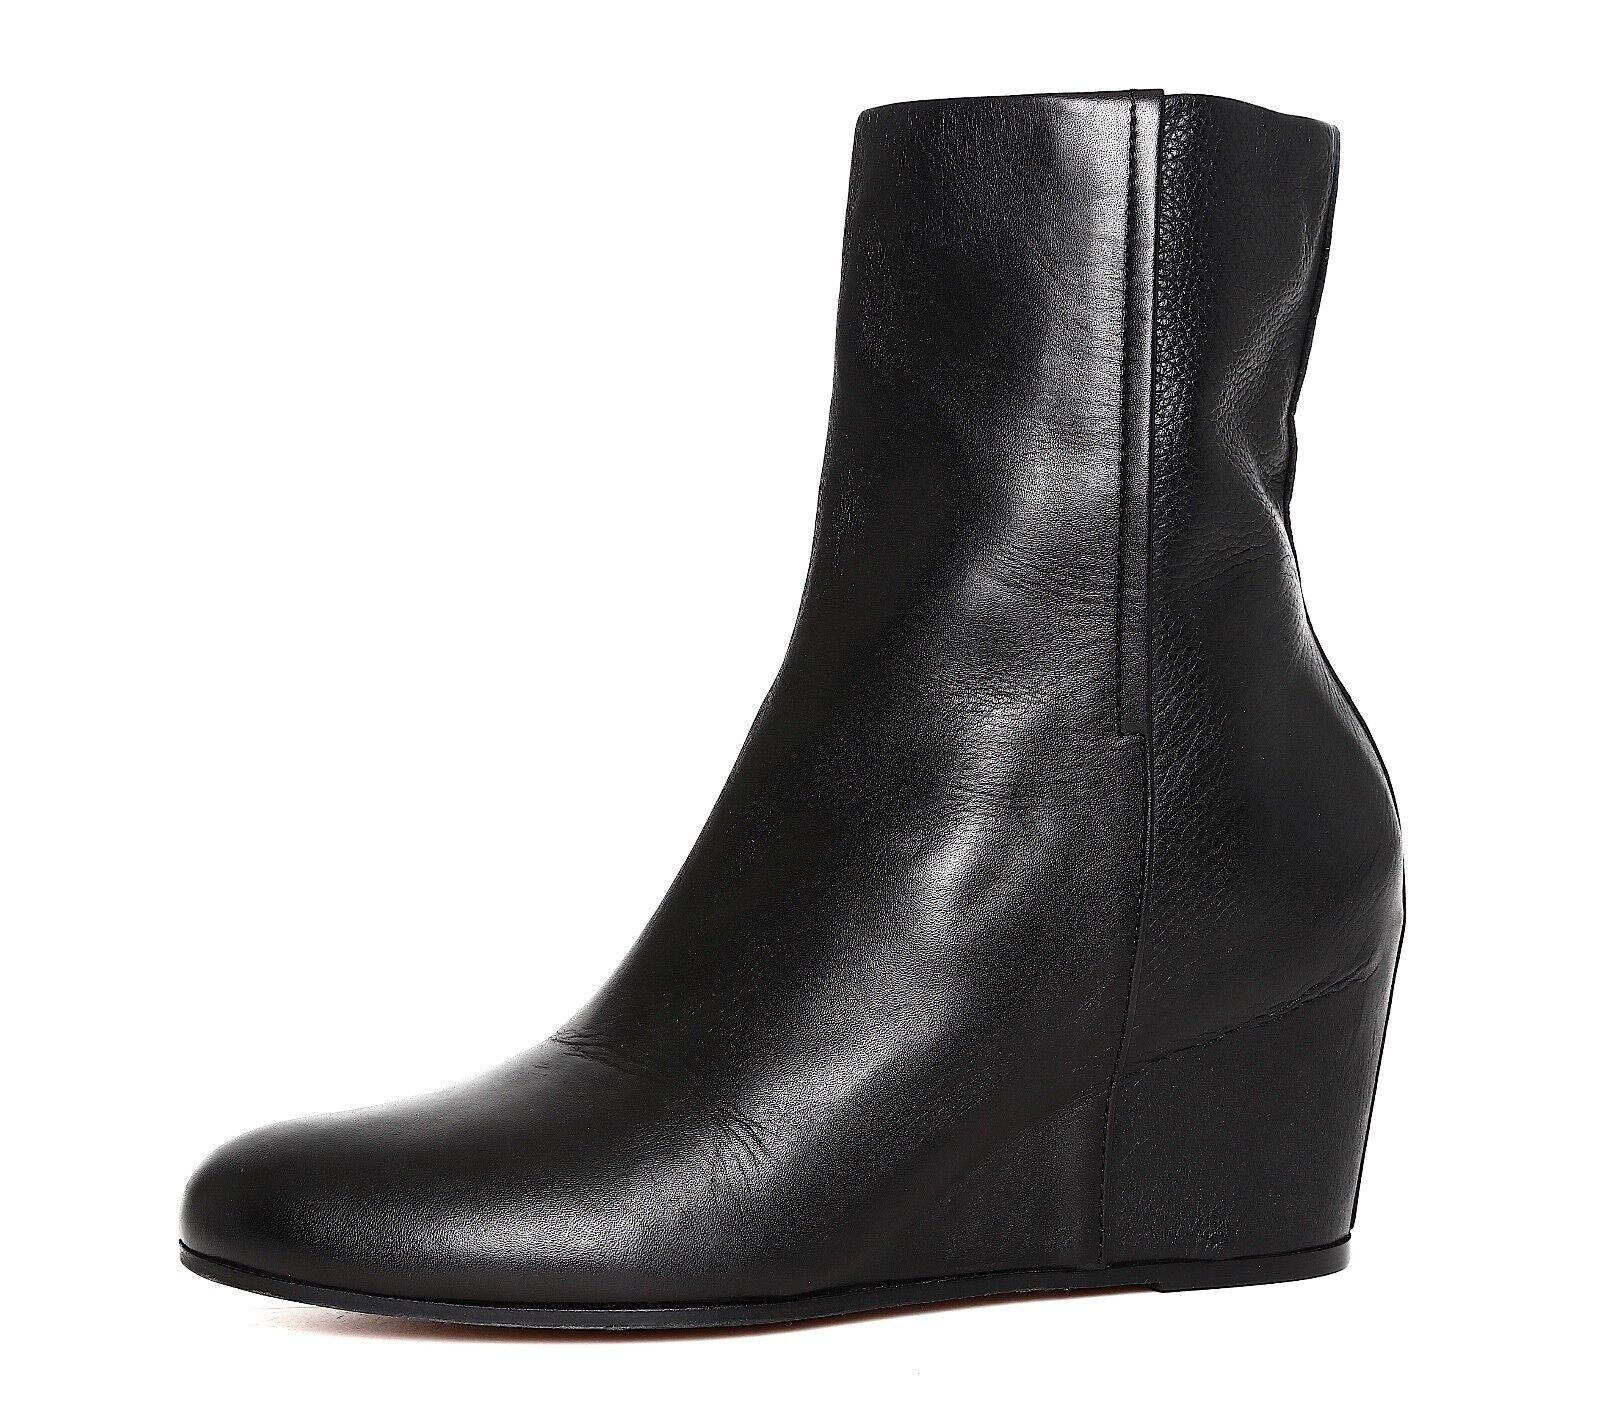 Vince Michela Wedge Leather Ankle Boot Black Women Sz 10 M 5903 *